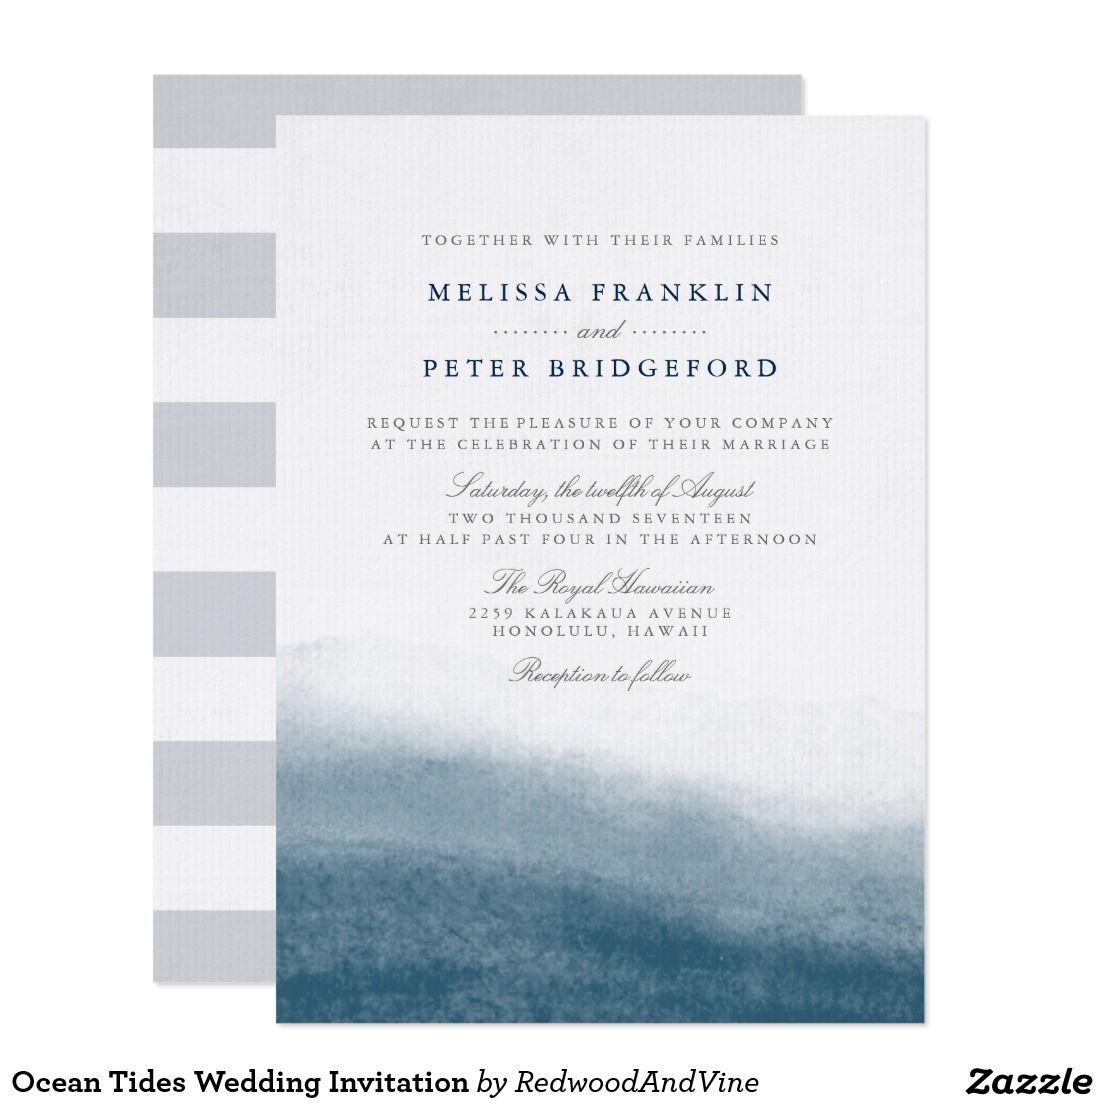 Ocean Tides Wedding Invitation | Zazzle | Pinterest | Zazzle invitations